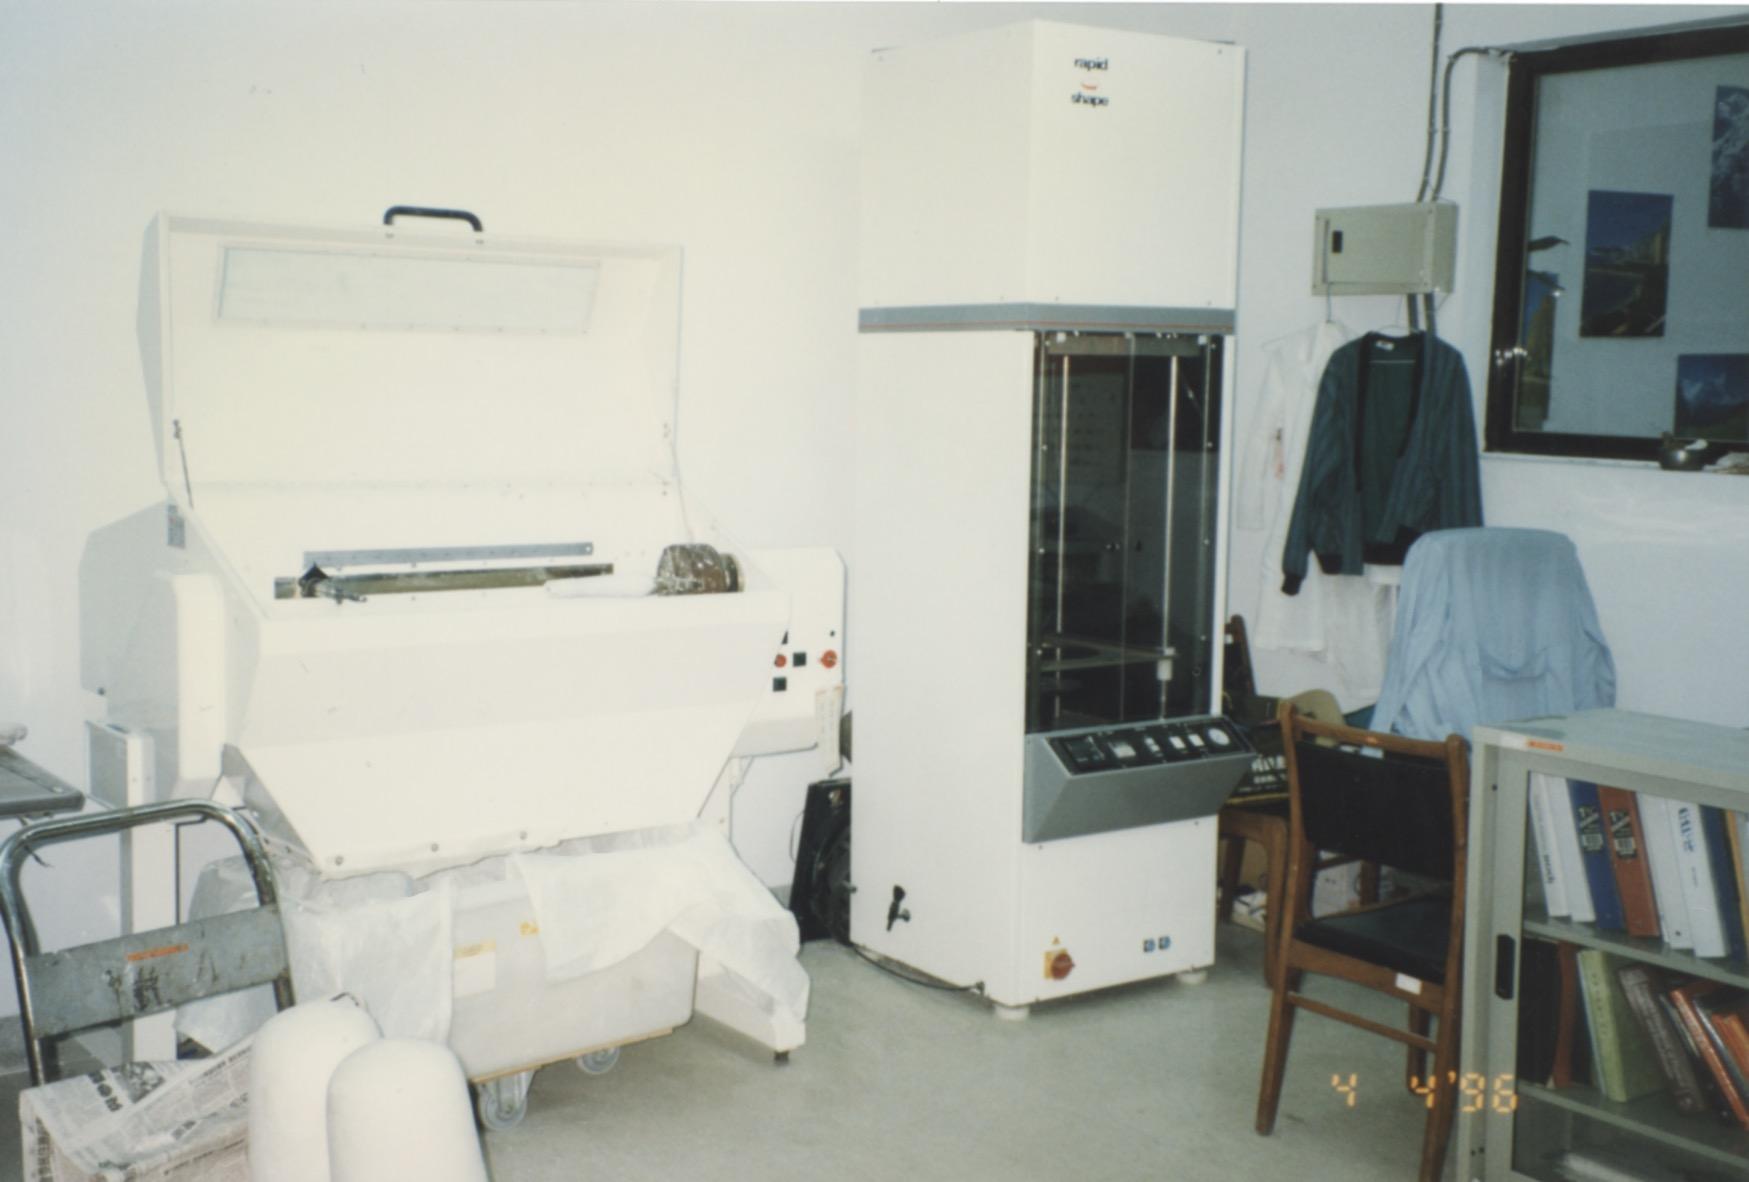 1996 VNAH in Taipei - 07.jpeg